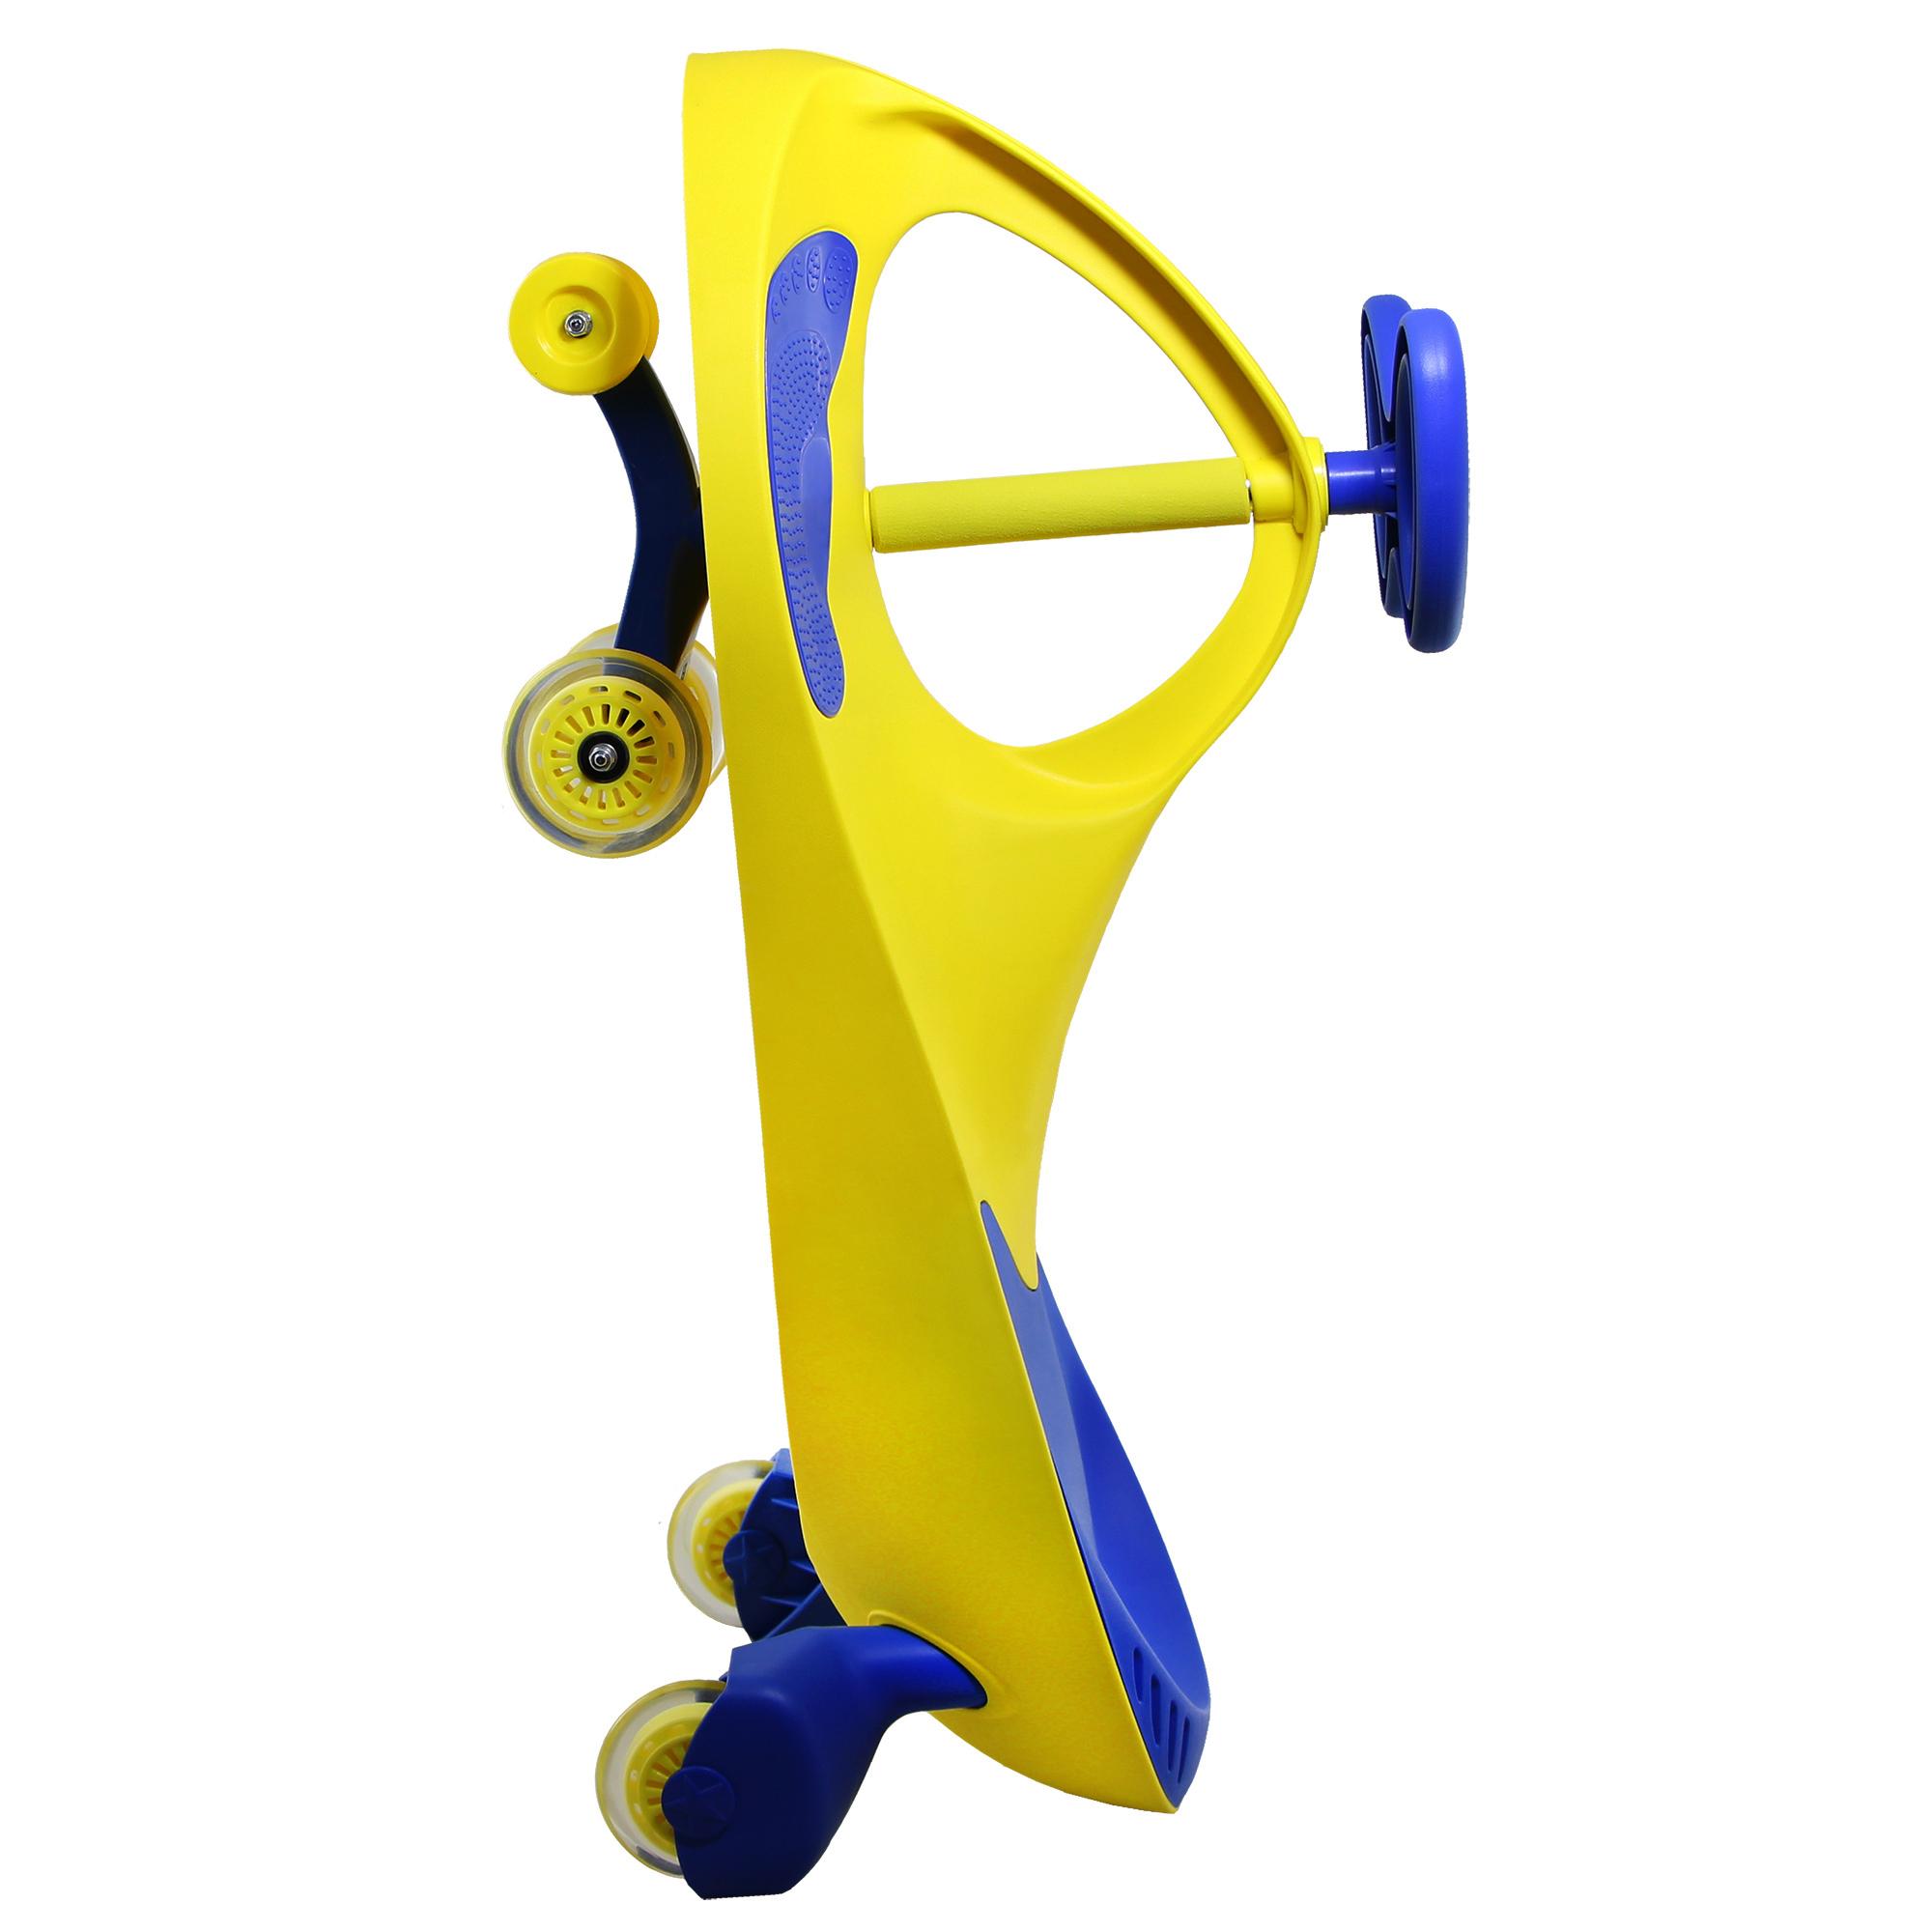 3Loopcar Yellow Blue 03